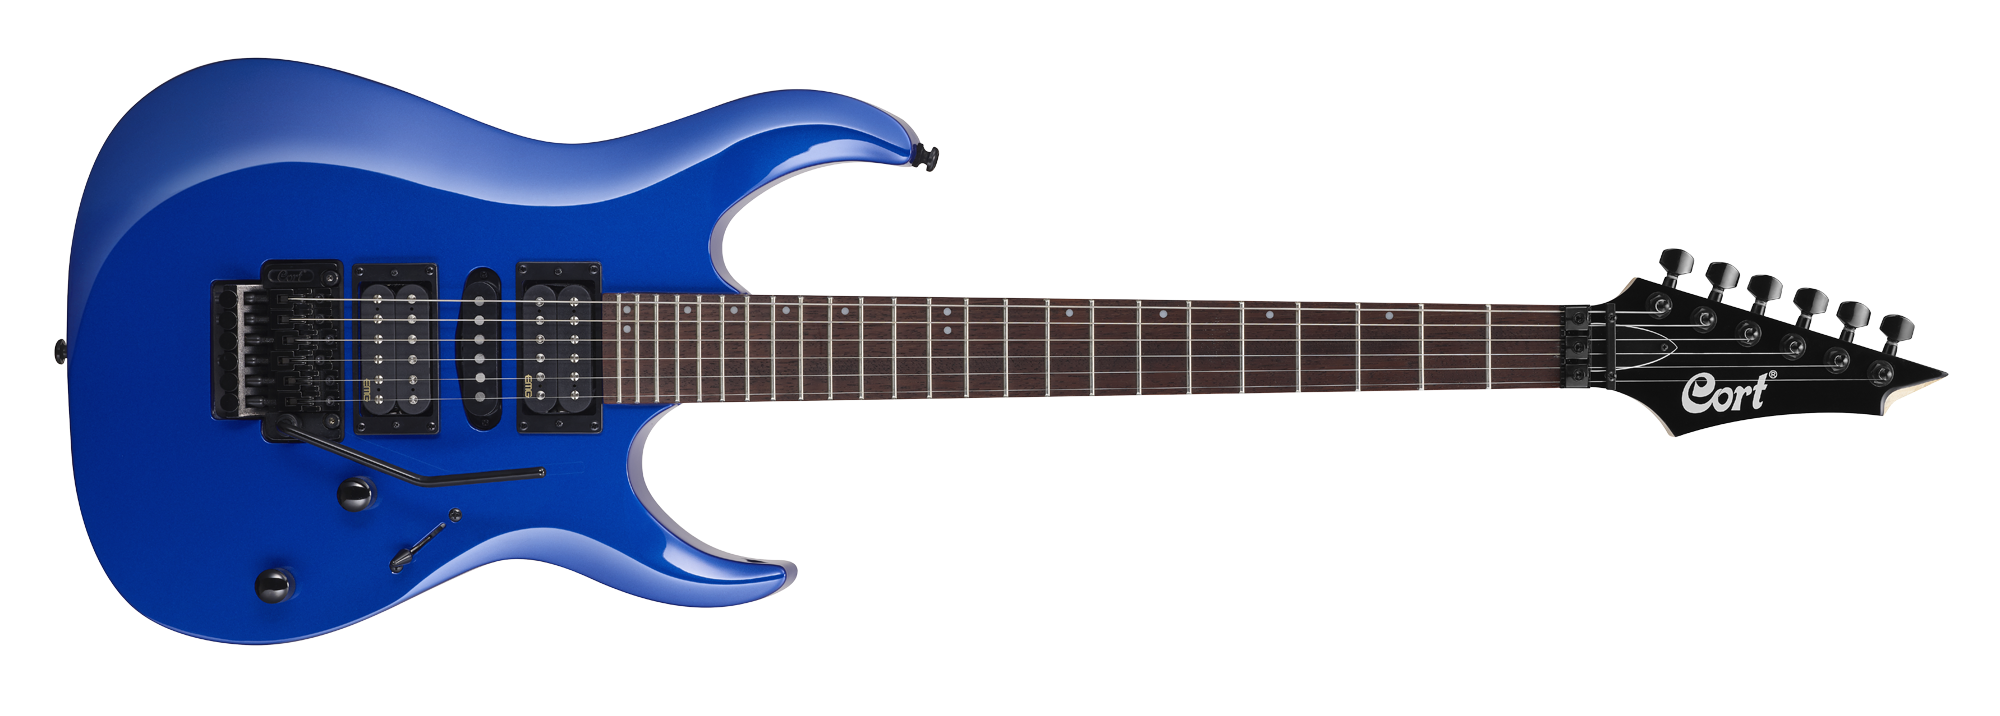 Cort  X-250